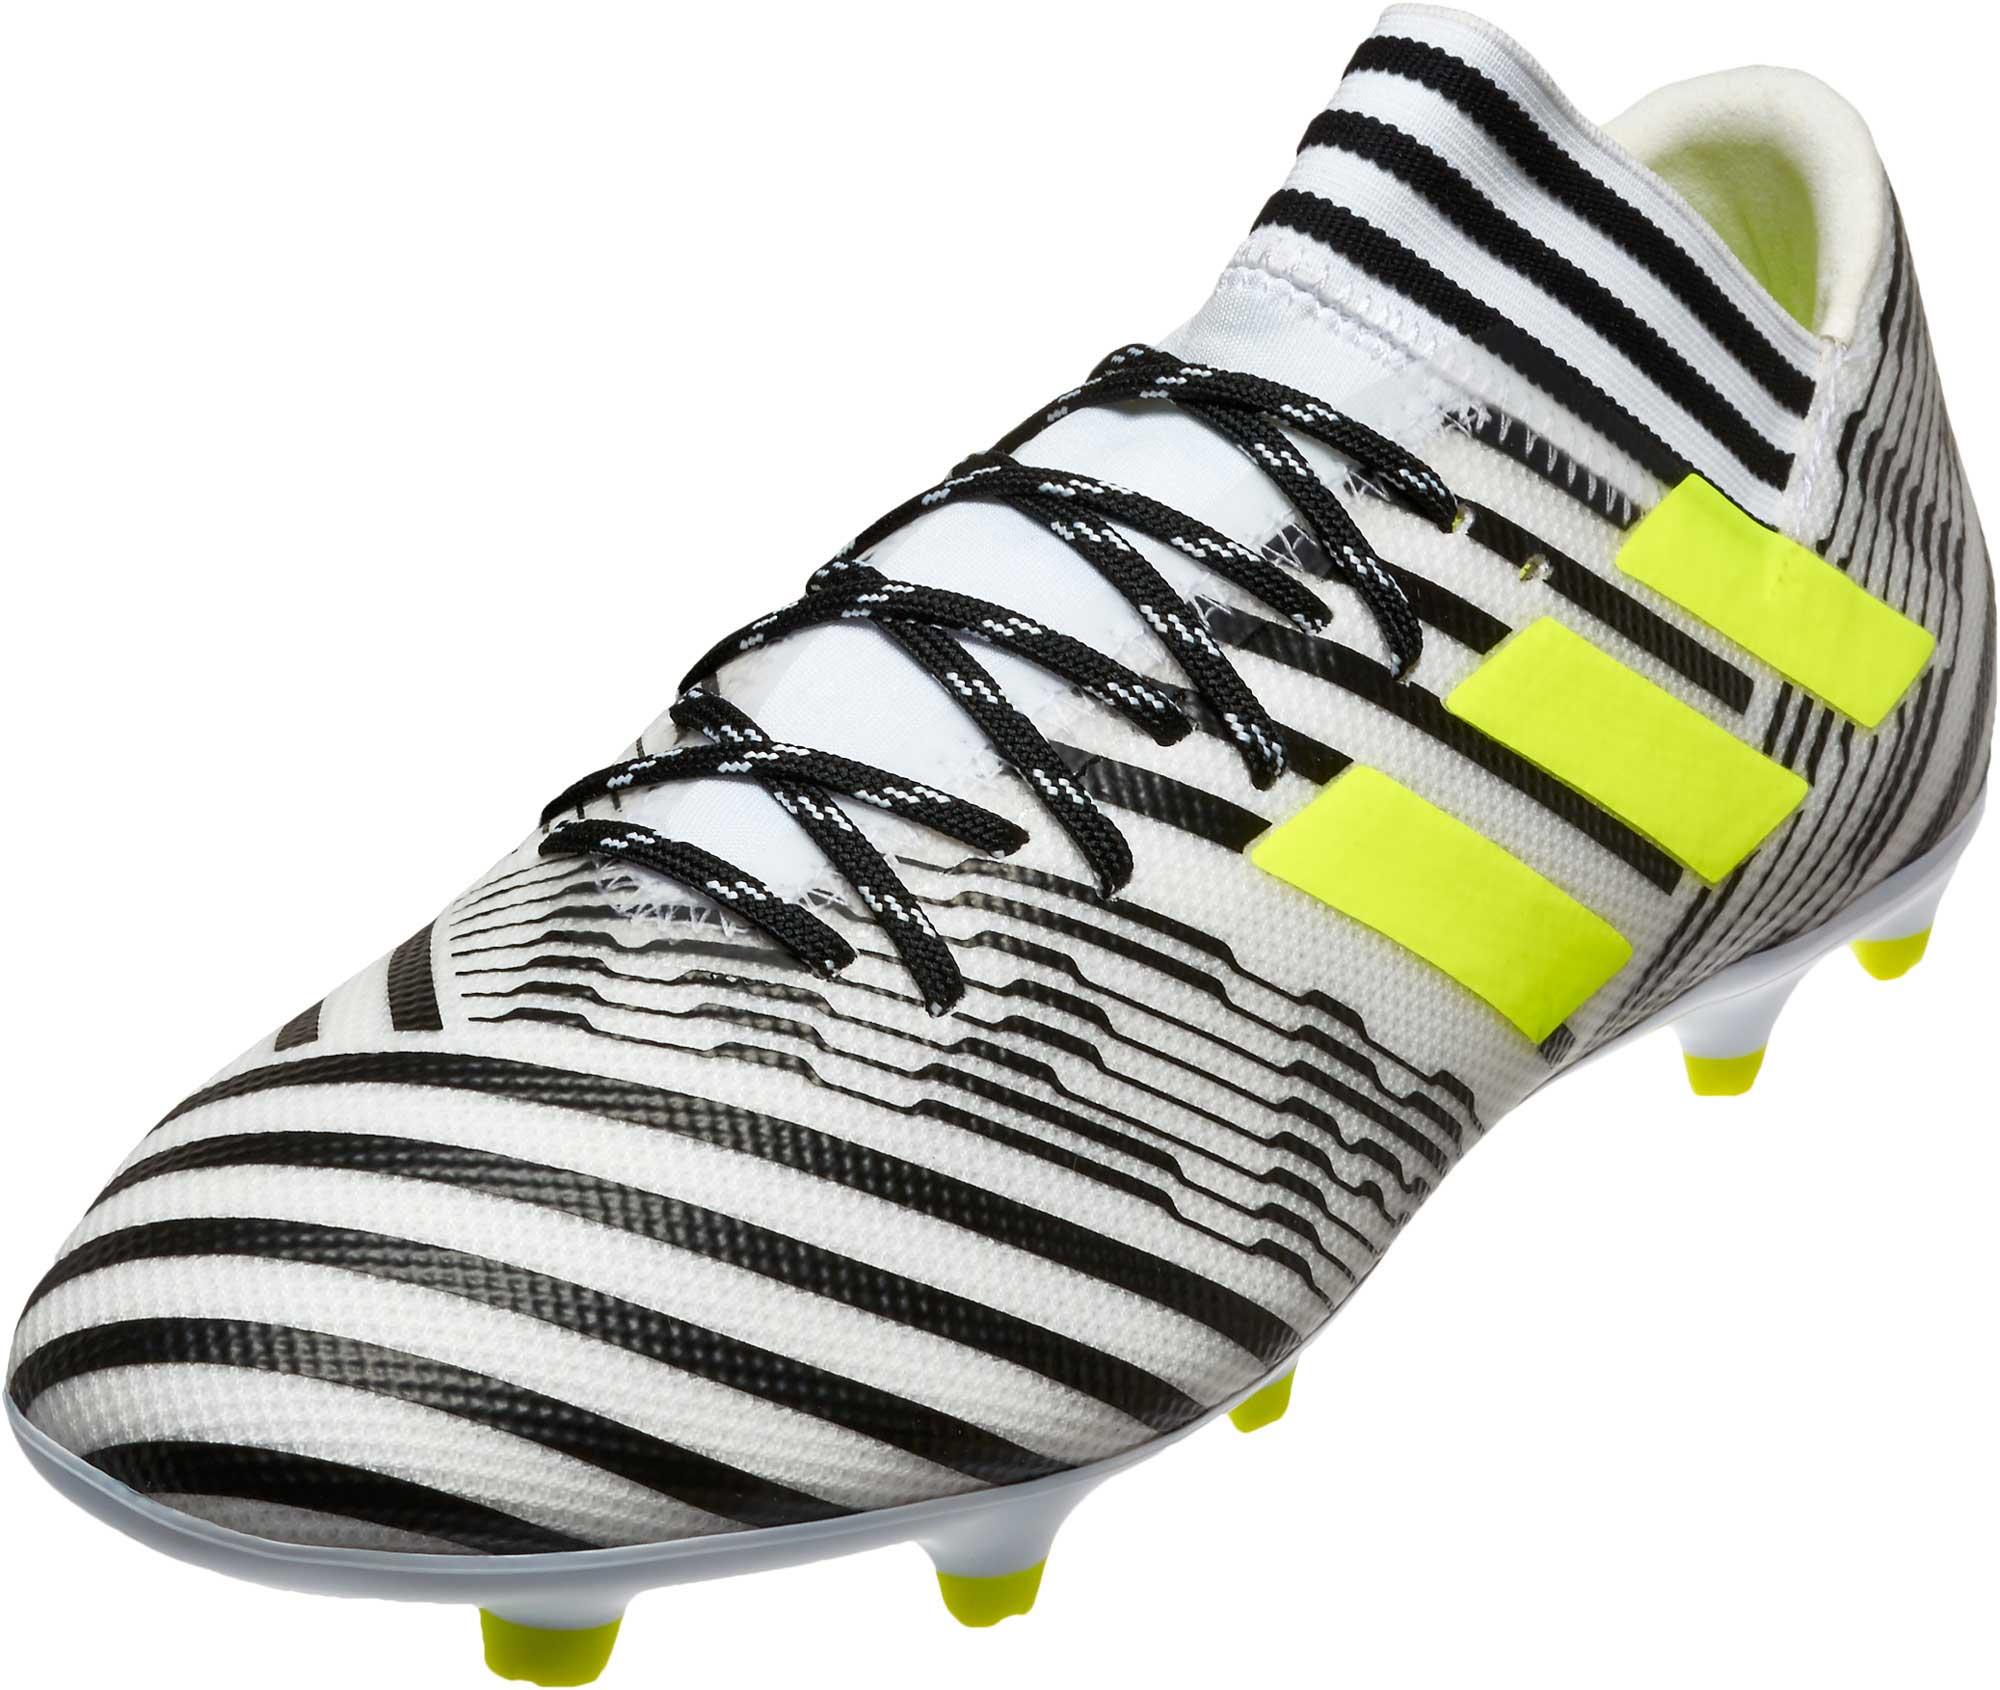 f972df1cd736 adidas Nemeziz 17.3 FG Soccer Cleats - White   Solar Yellow ...